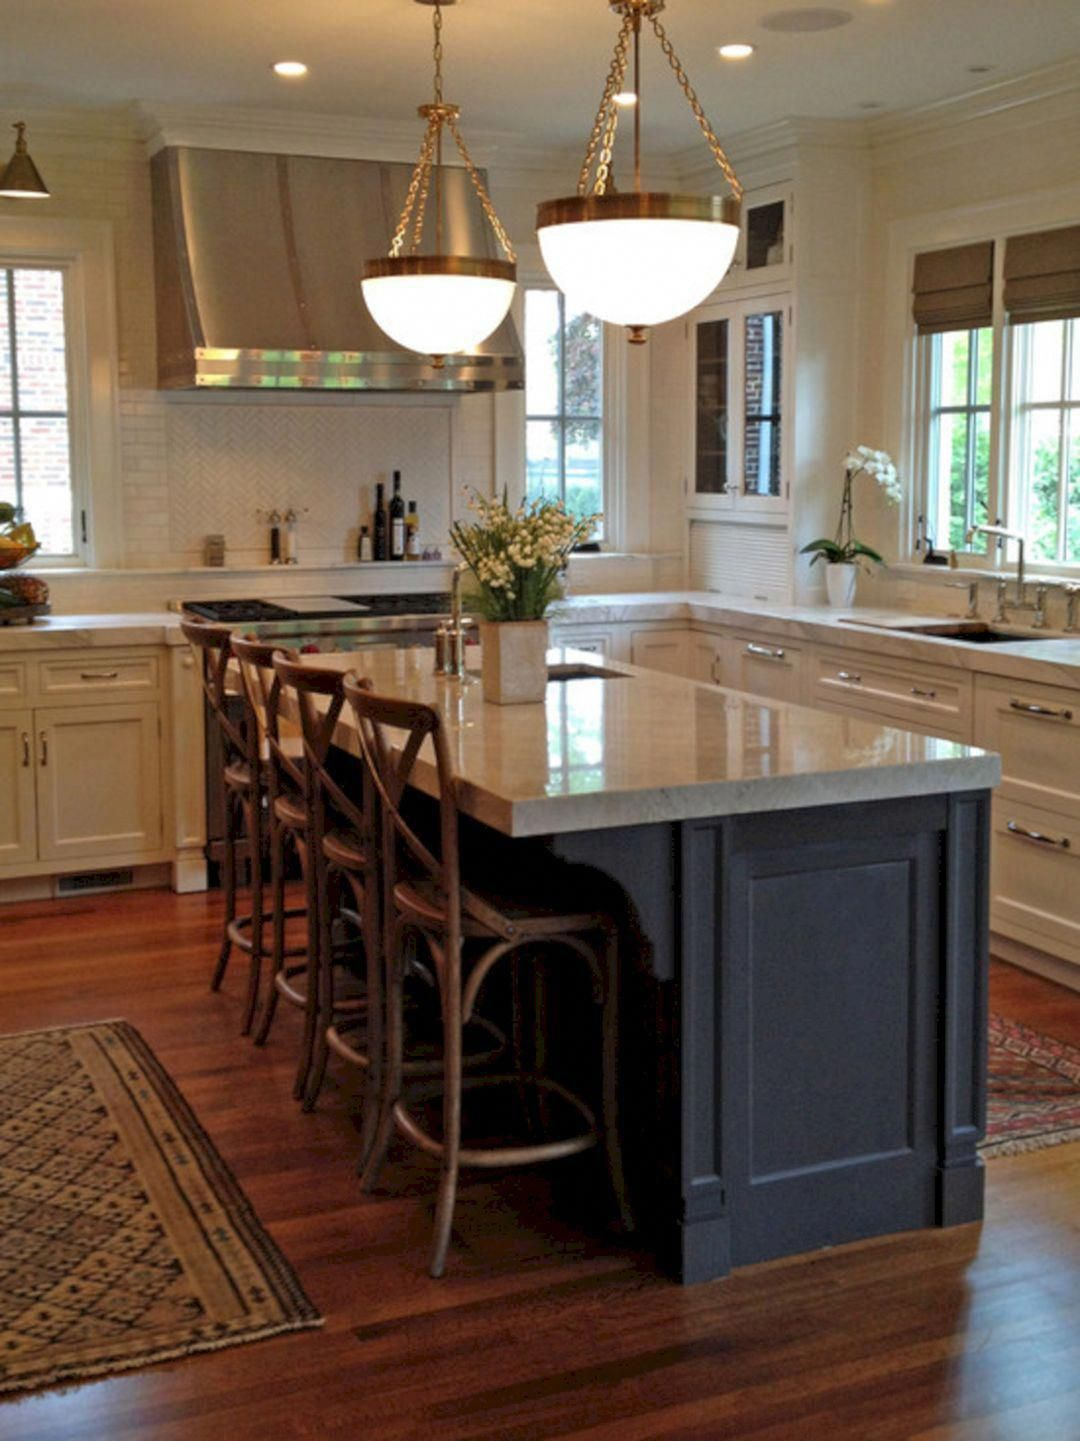 Amazing small kitchen ideas for big taste 530 decoor